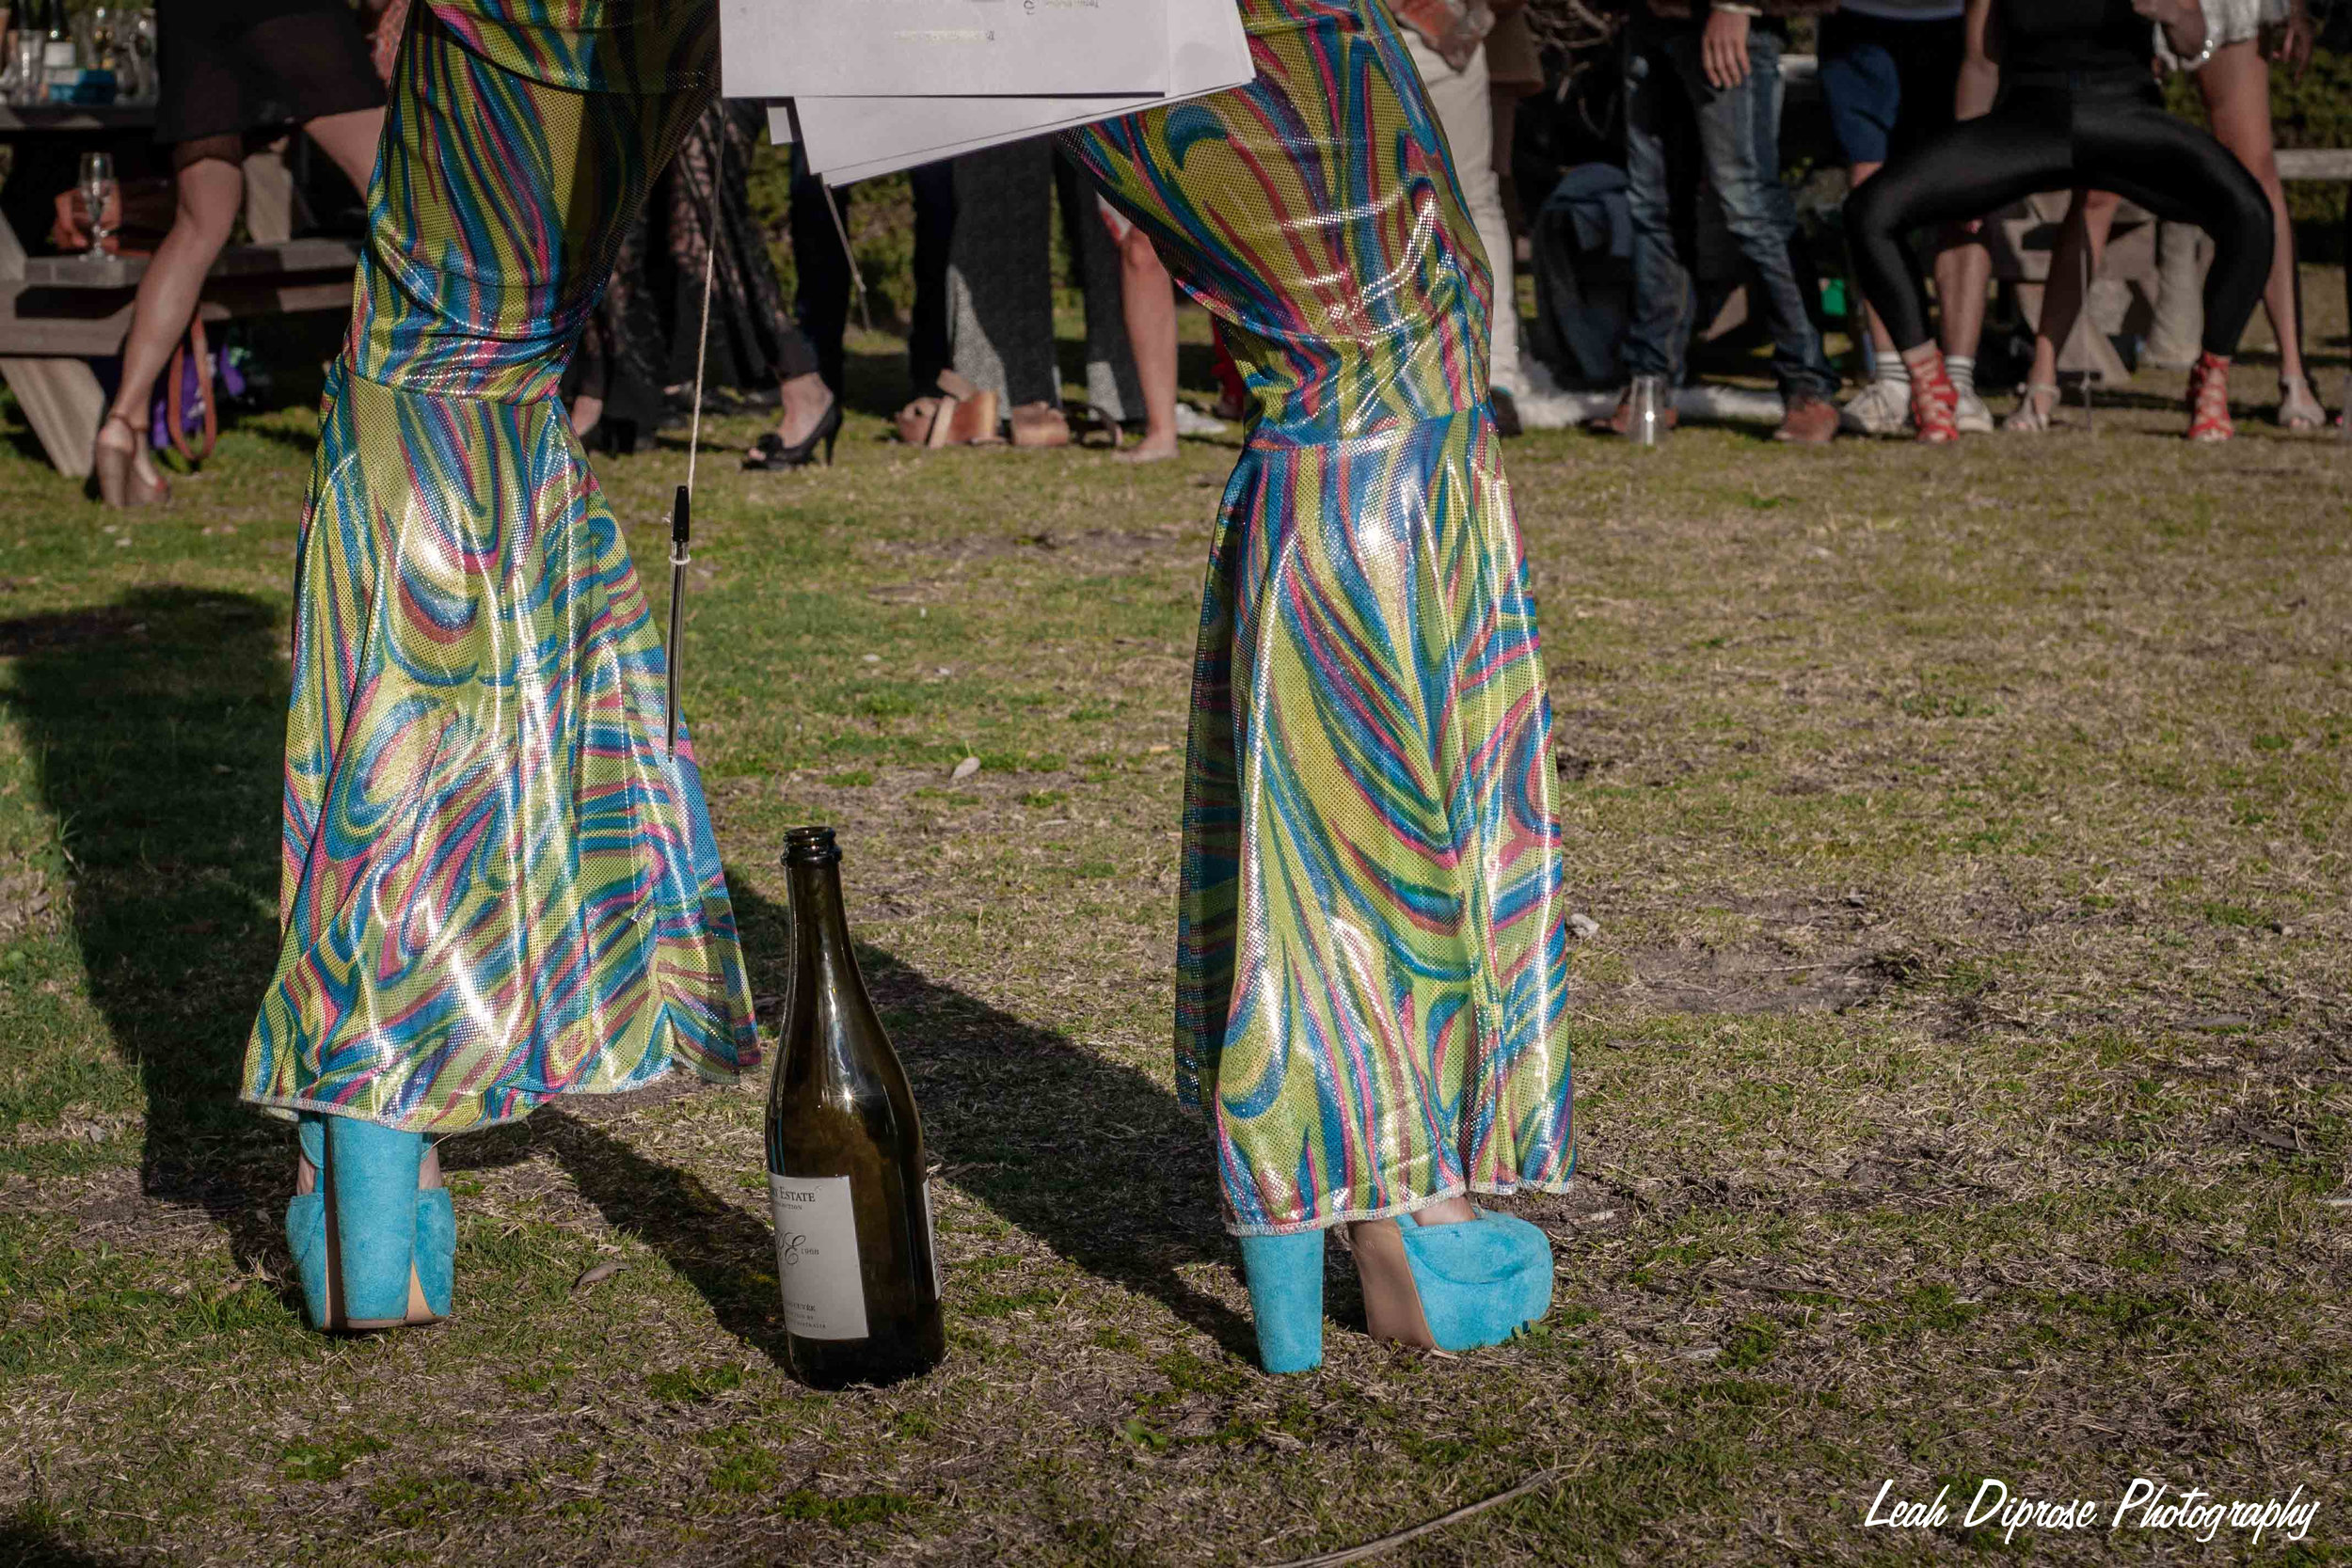 Leah Diprose Photography image-9835.jpg